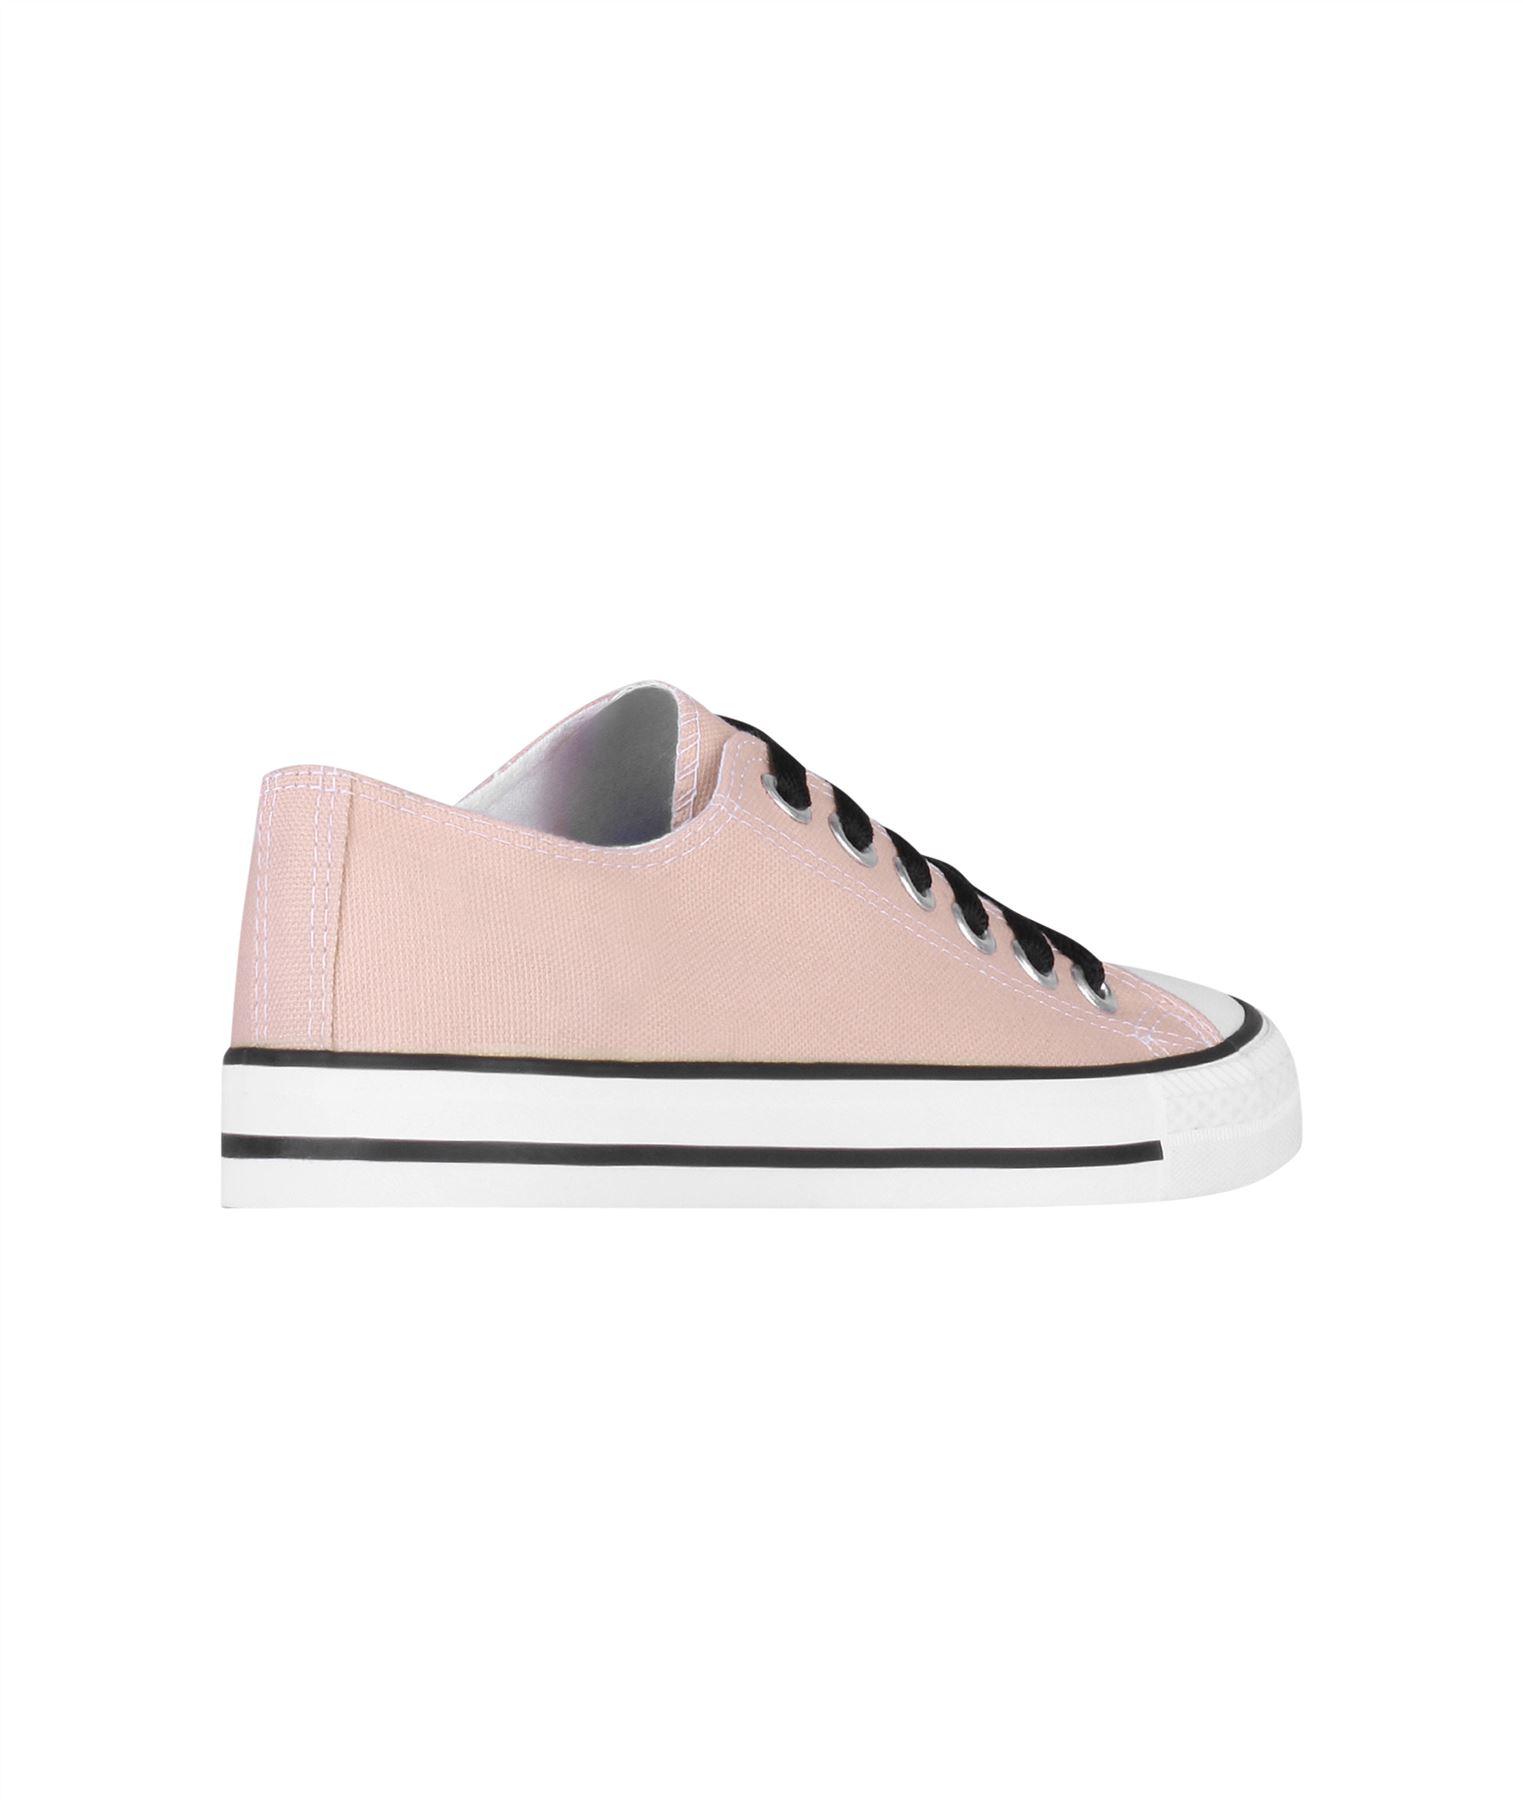 Zapatillas-Mujer-Casuales-Deportiva-Barata-Lona-Moda-Originales-Outlet-Tela-Moda miniatura 49